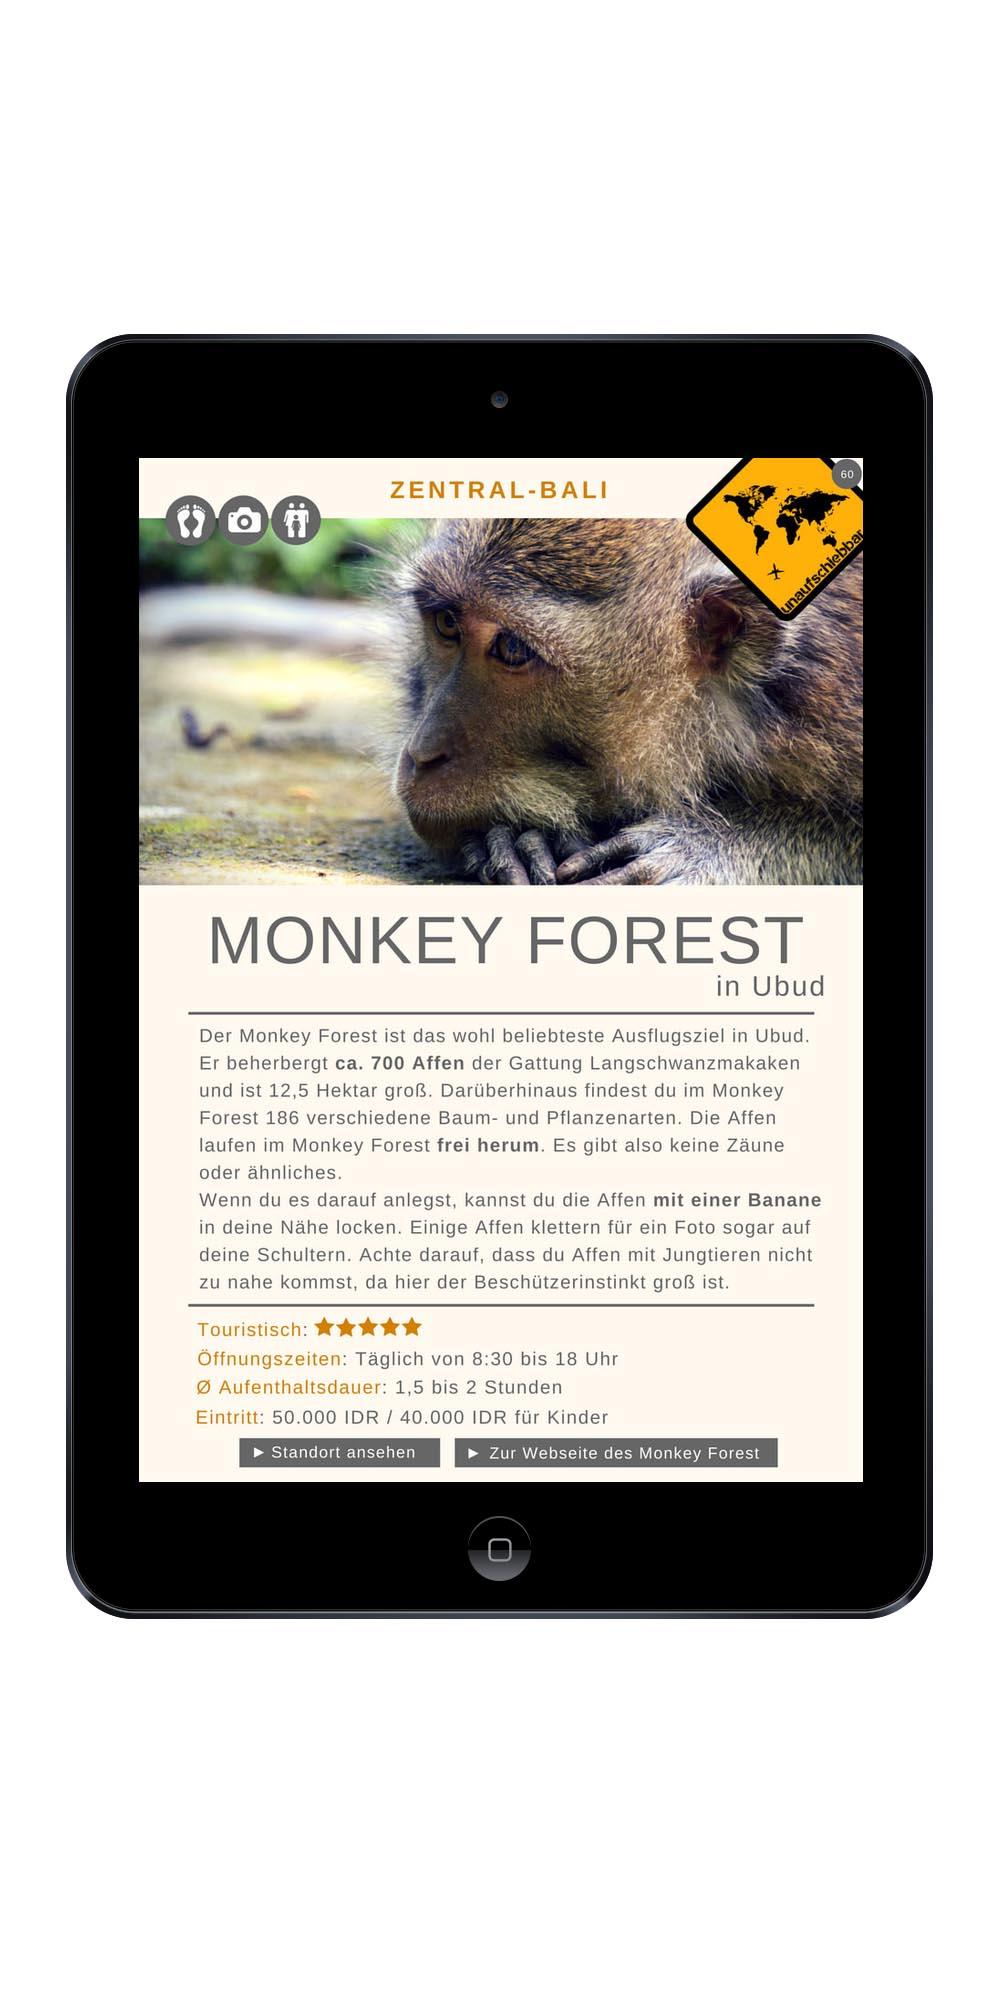 222 Lombok & Bali Highlights - 52 Monkey Forest